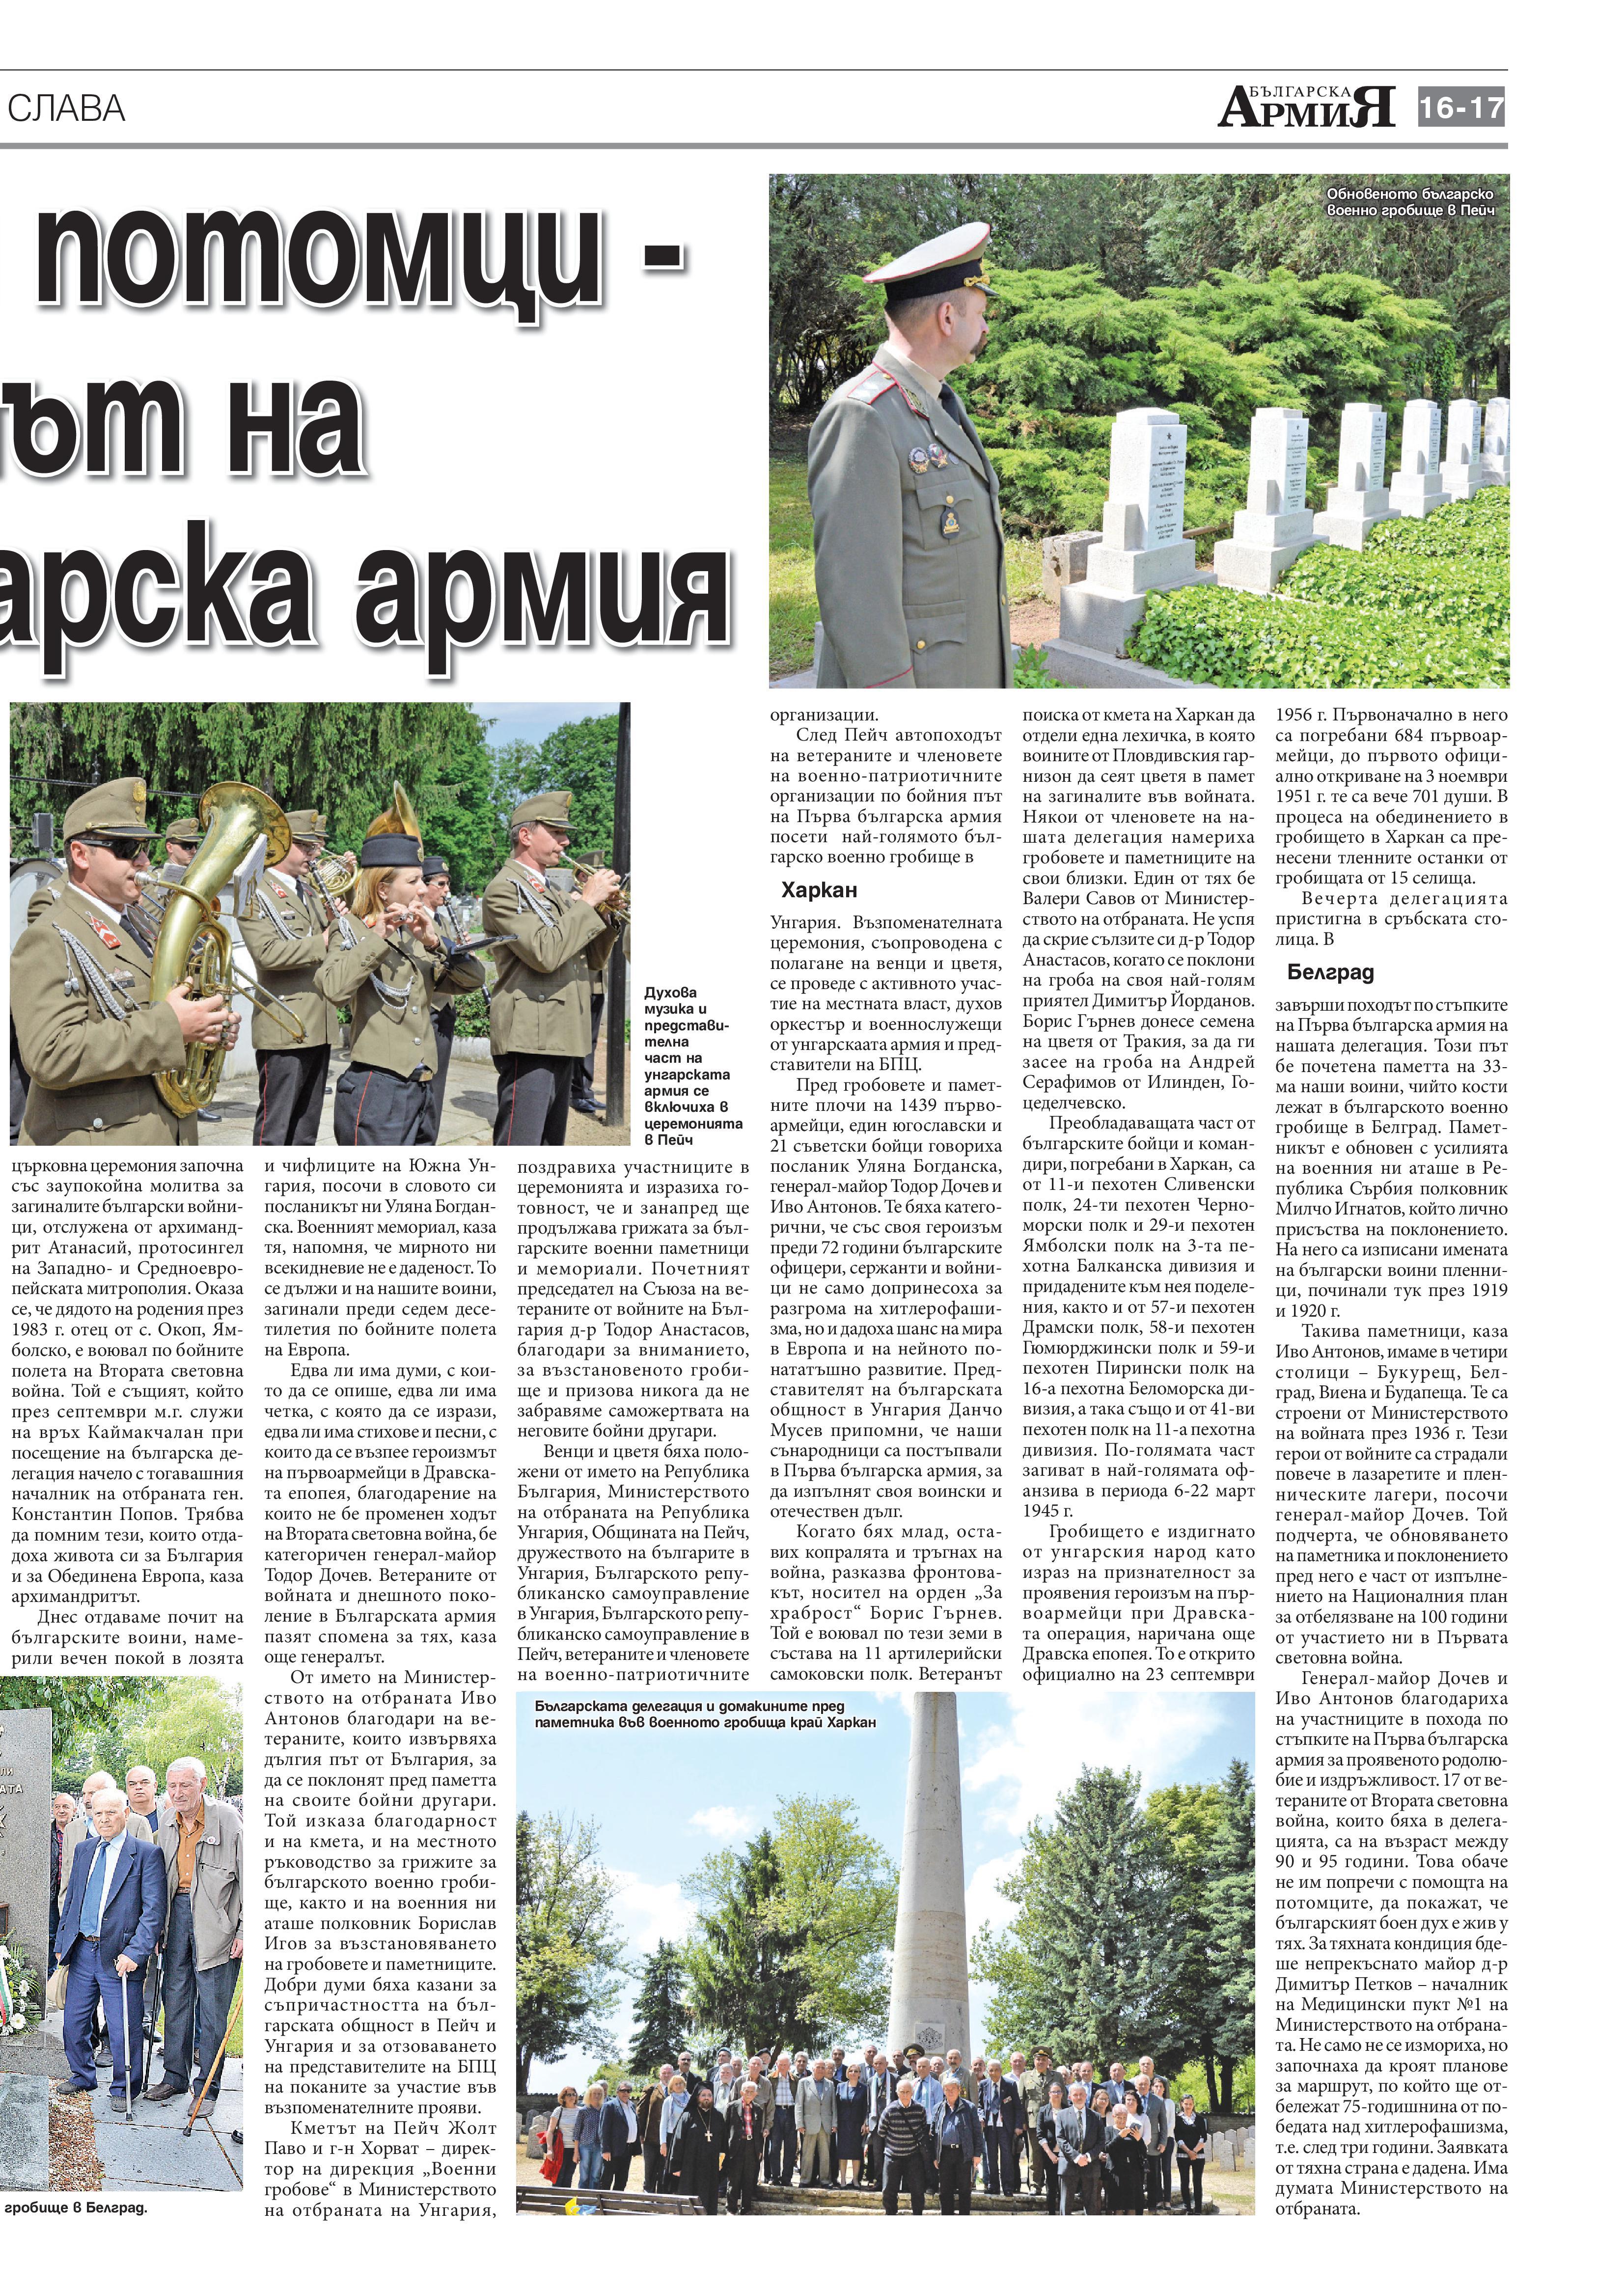 http://armymedia.bg/wp-content/uploads/2017/05/17-2.jpg